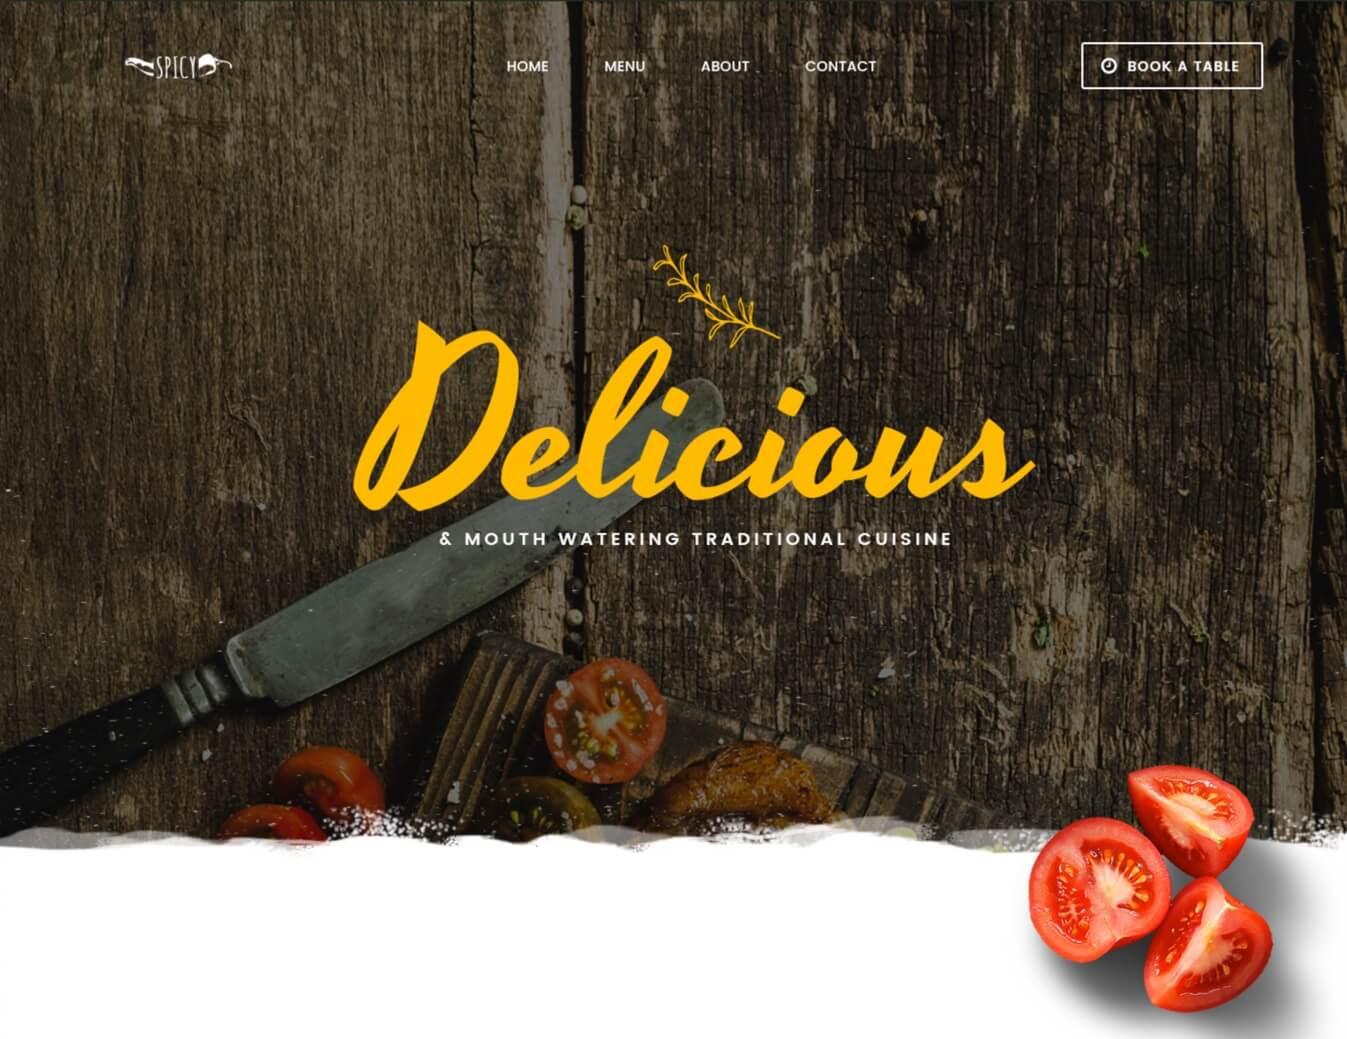 Spice Restaurant Template PSD